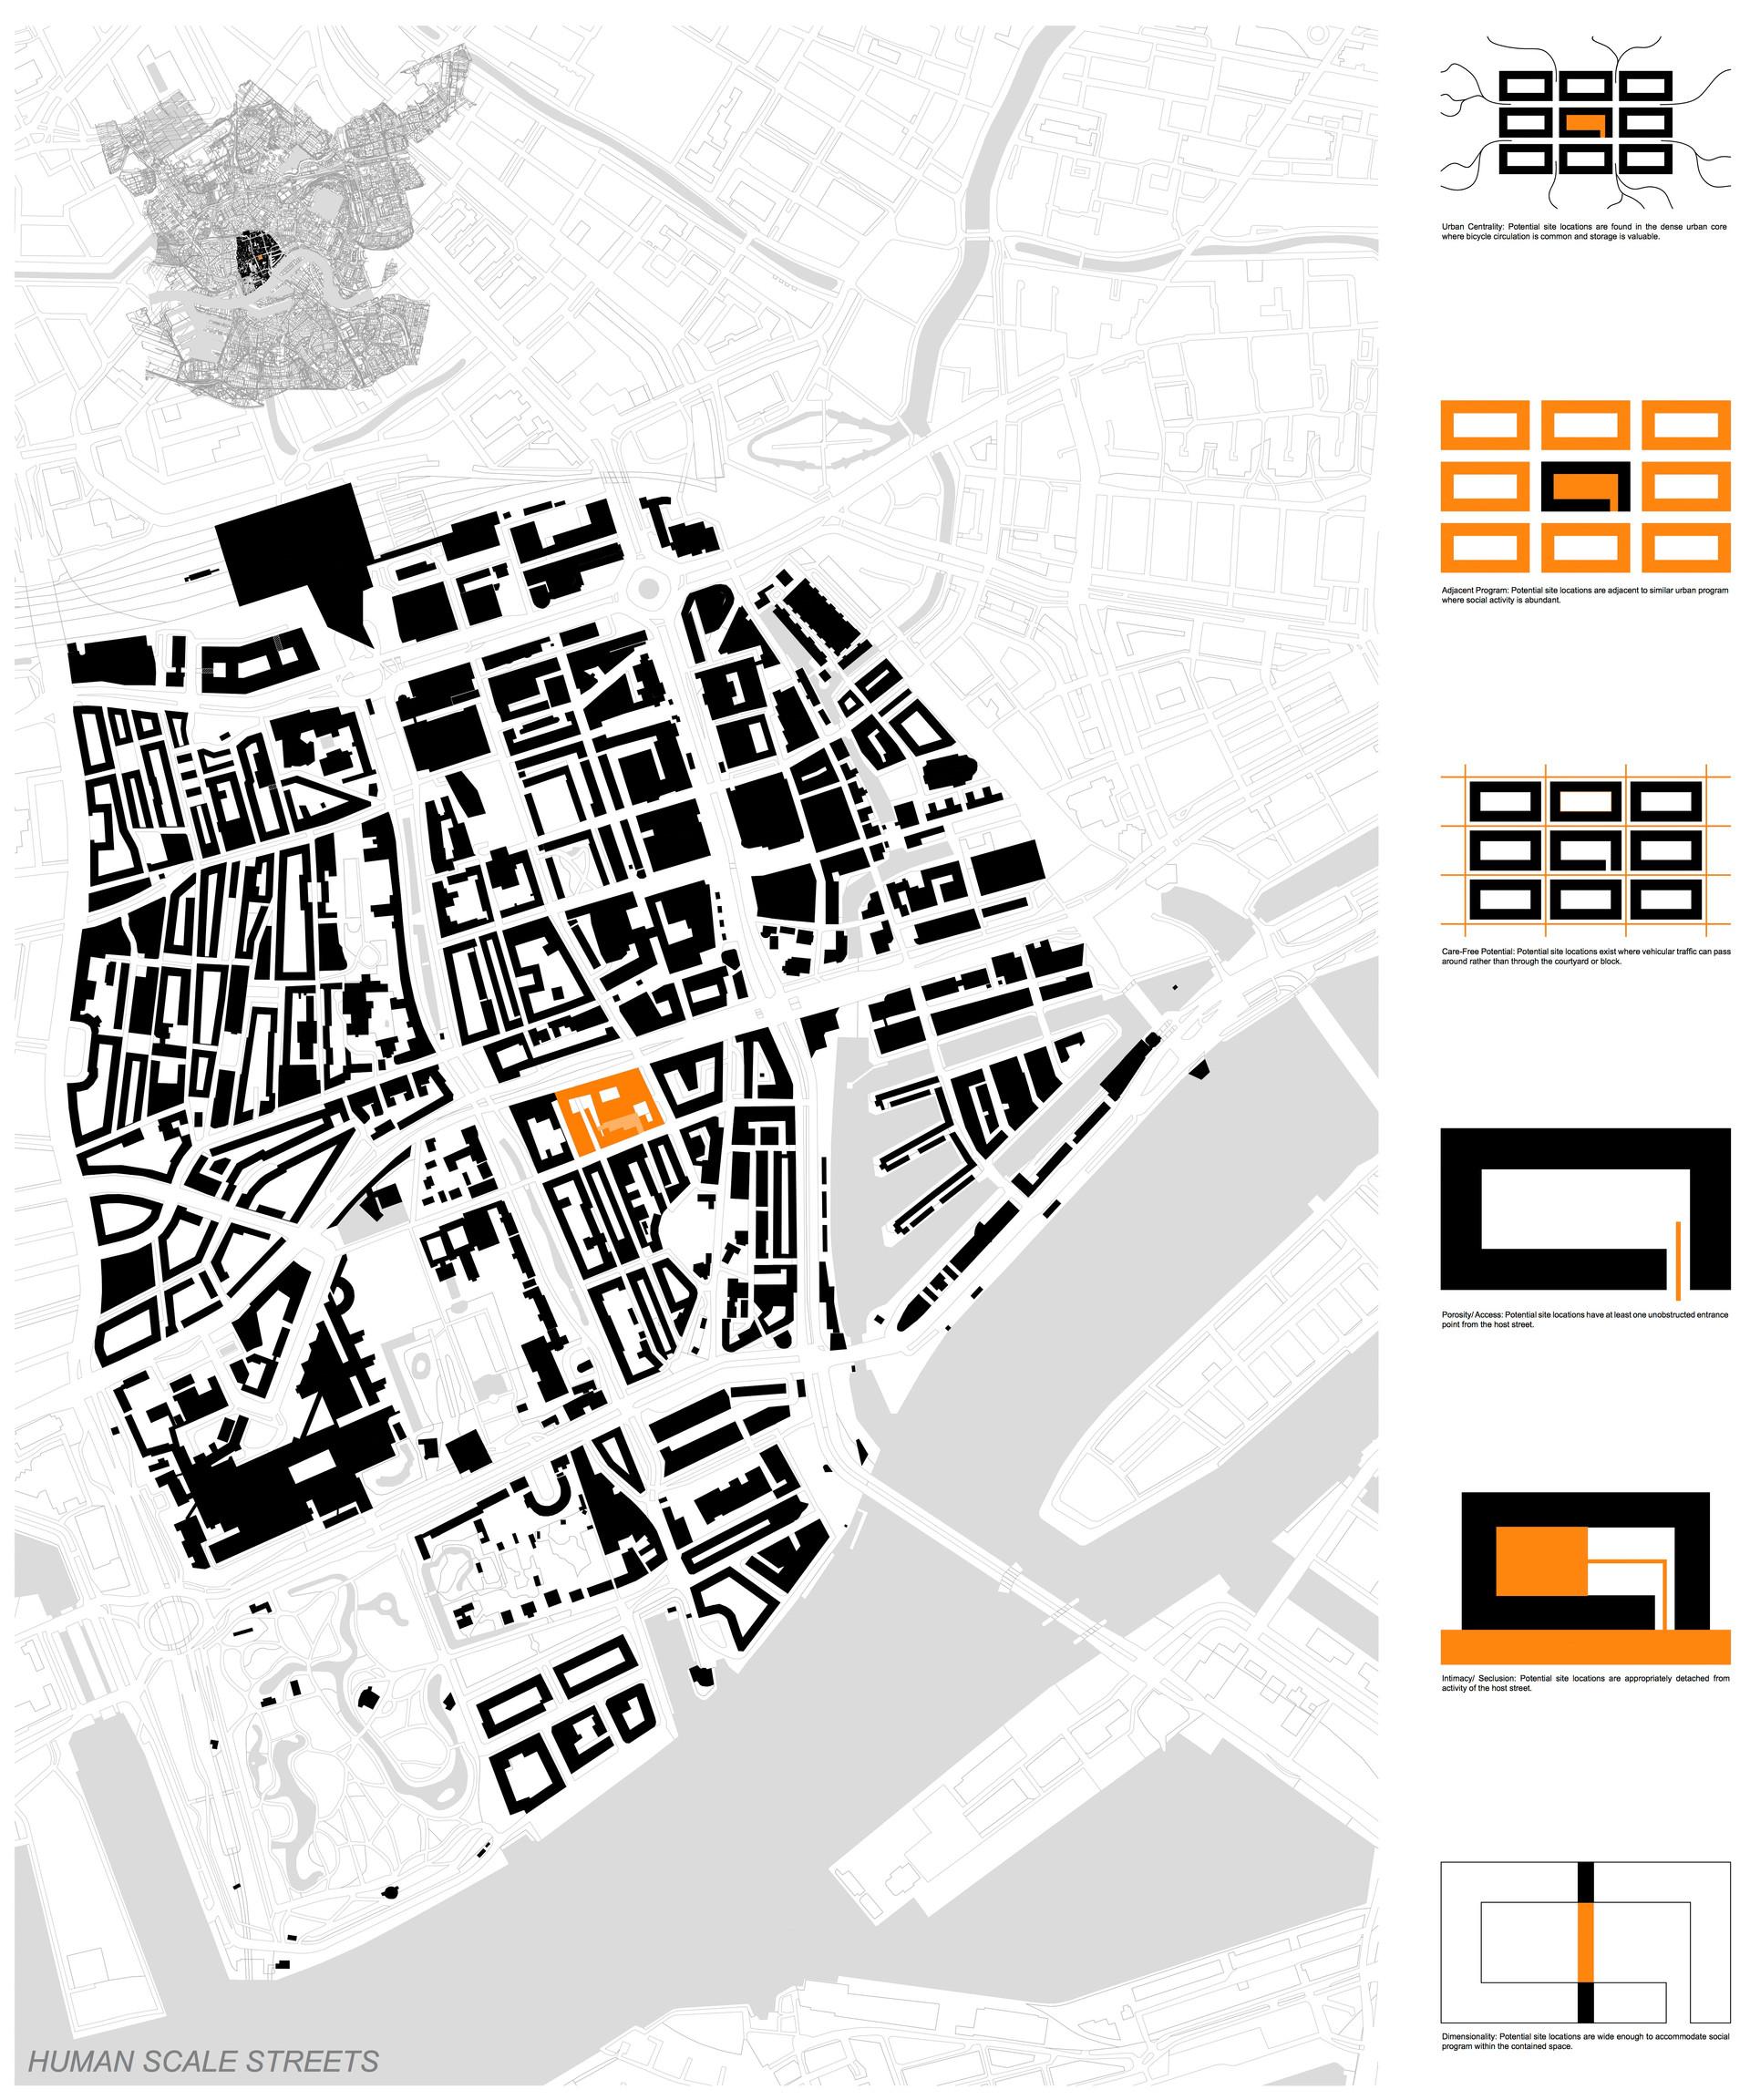 36x24_FG_Map.jpg